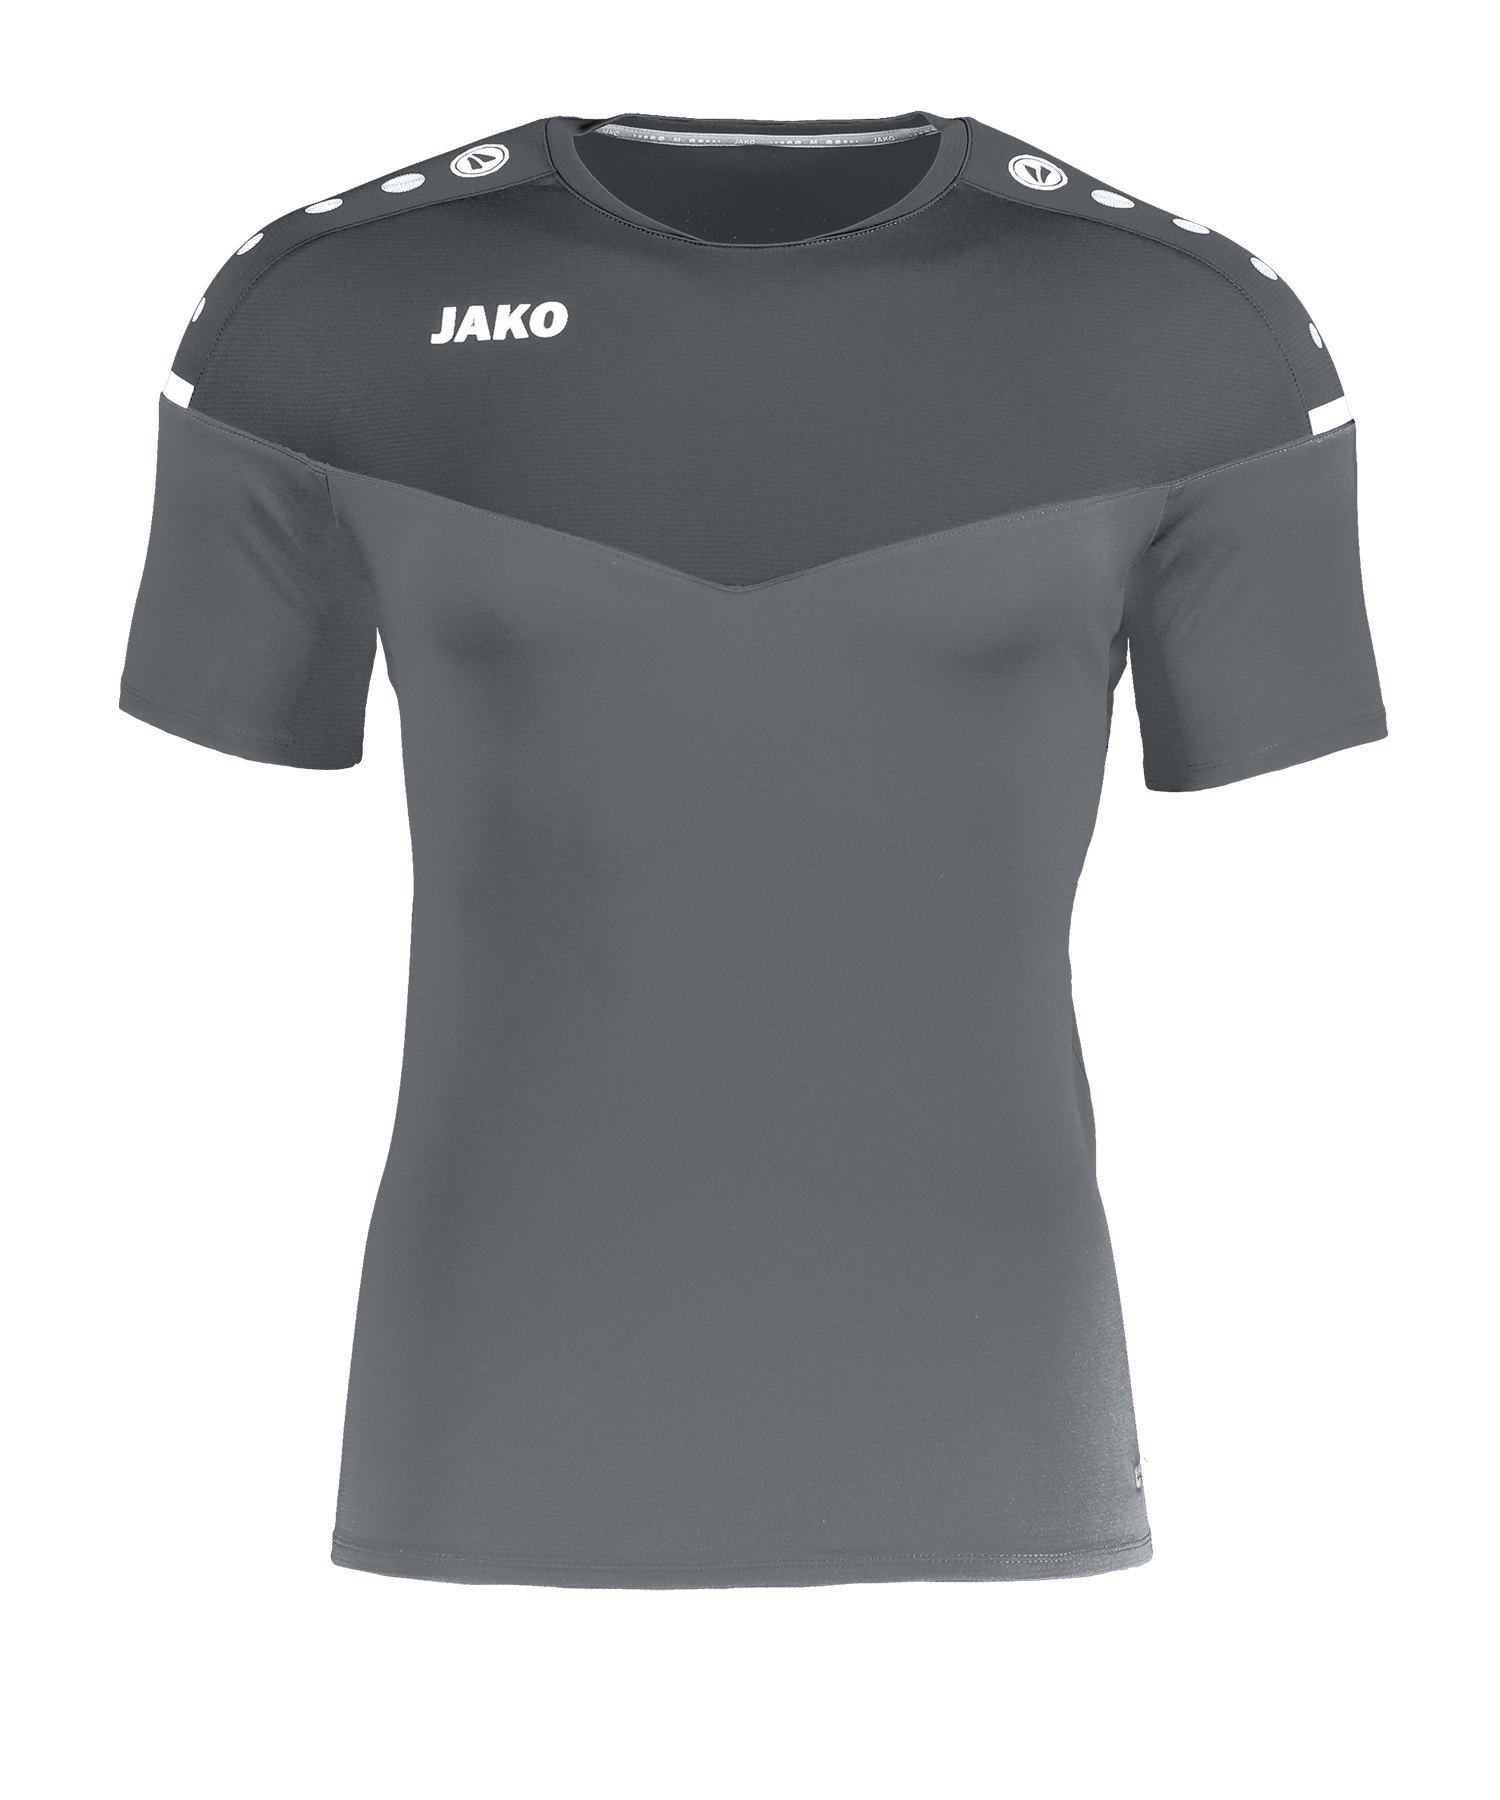 Jako Champ 2.0 T-Shirt Damen Grau F40 - grau